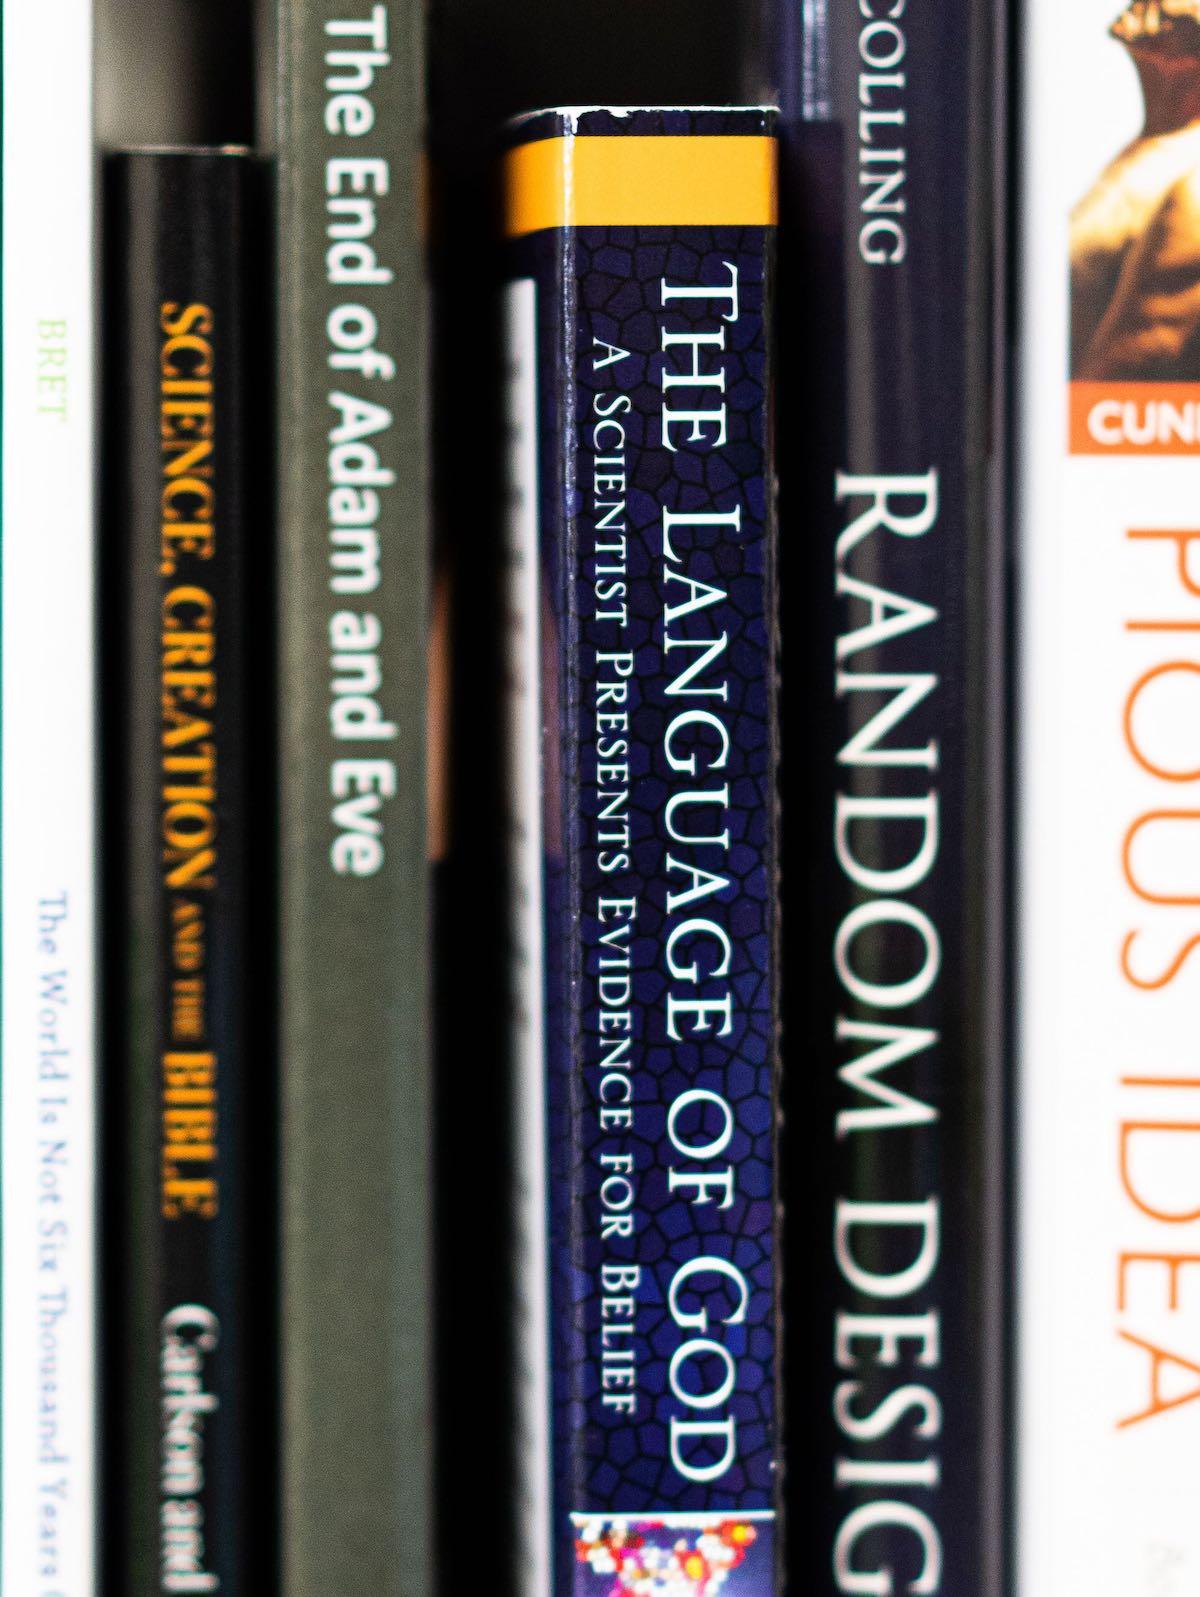 Language of God on a shelf